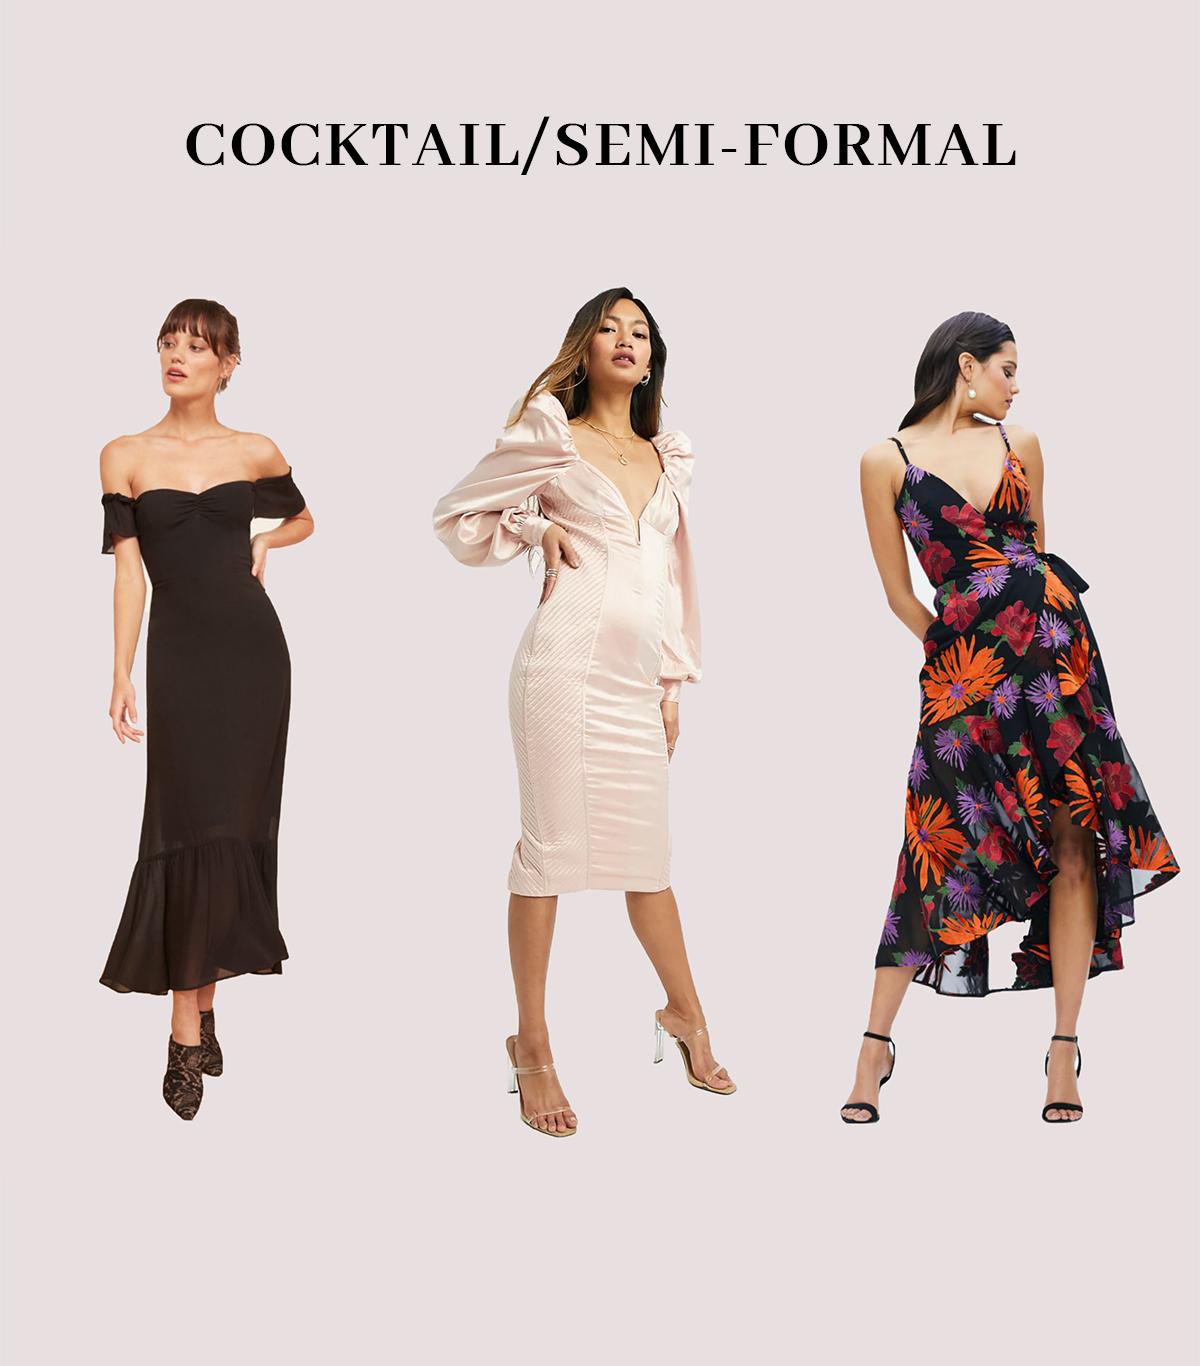 cocktail semi formal wedding guest dresses